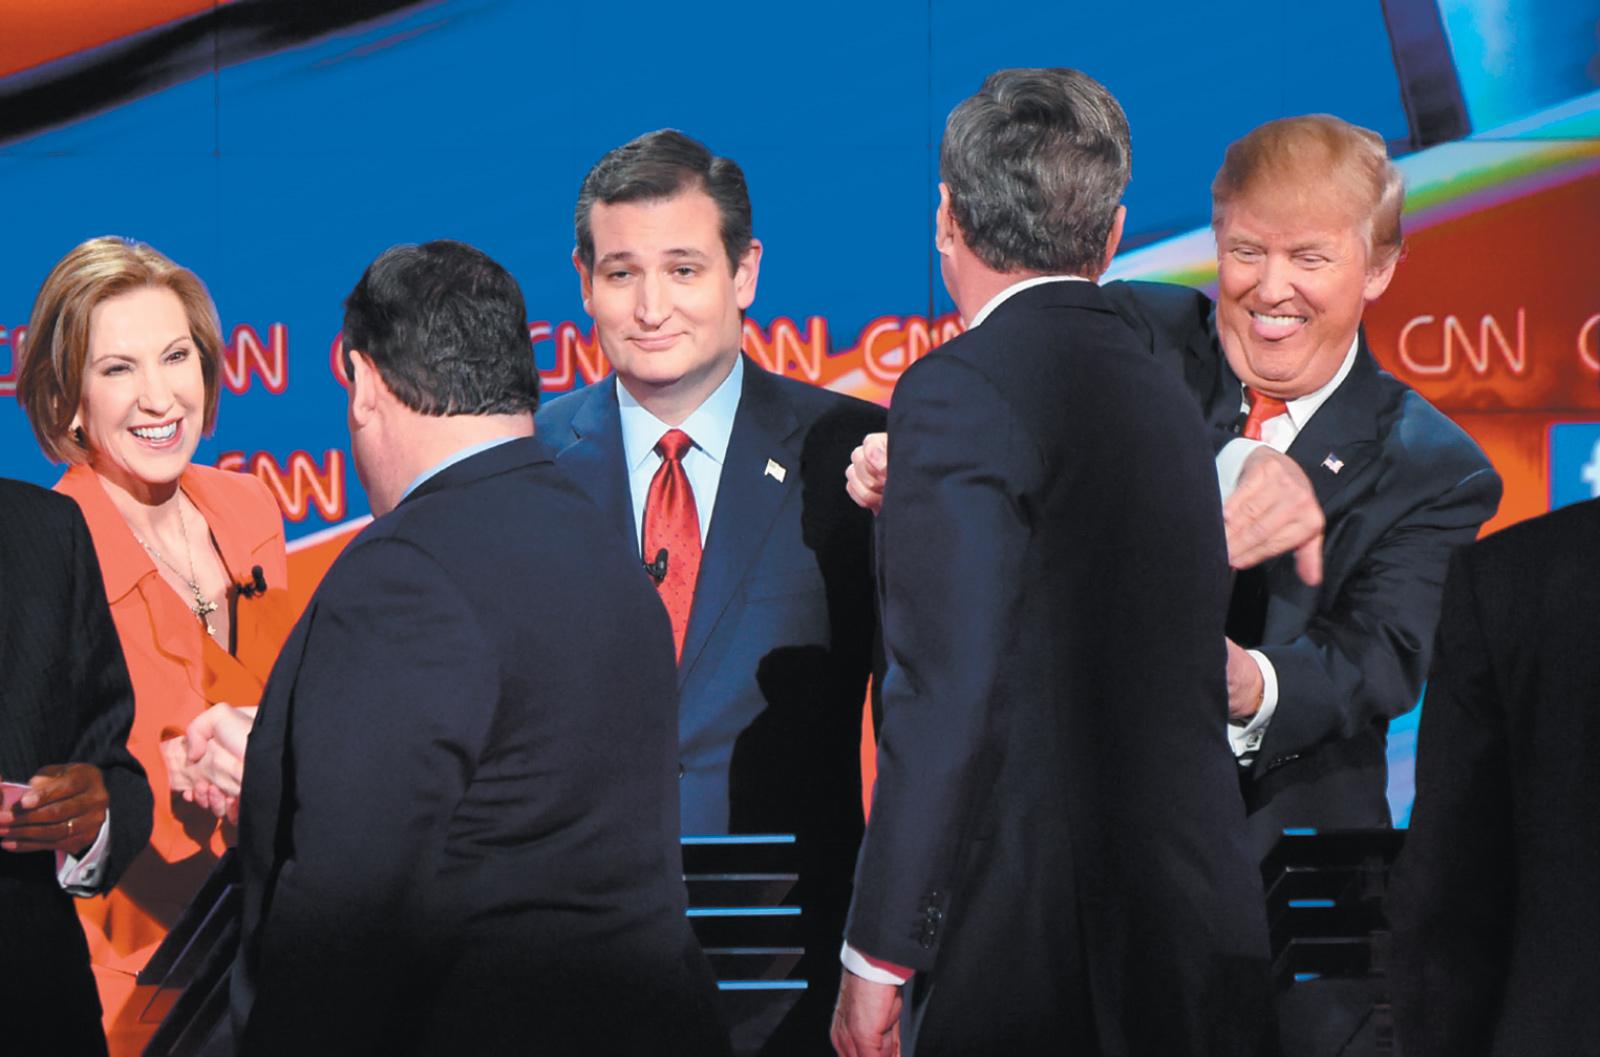 Carly Fiorina, Chris Christie, Ted Cruz, Jeb Bush, and Donald Trump at the Republican presidential debate in Las Vegas, December 2015